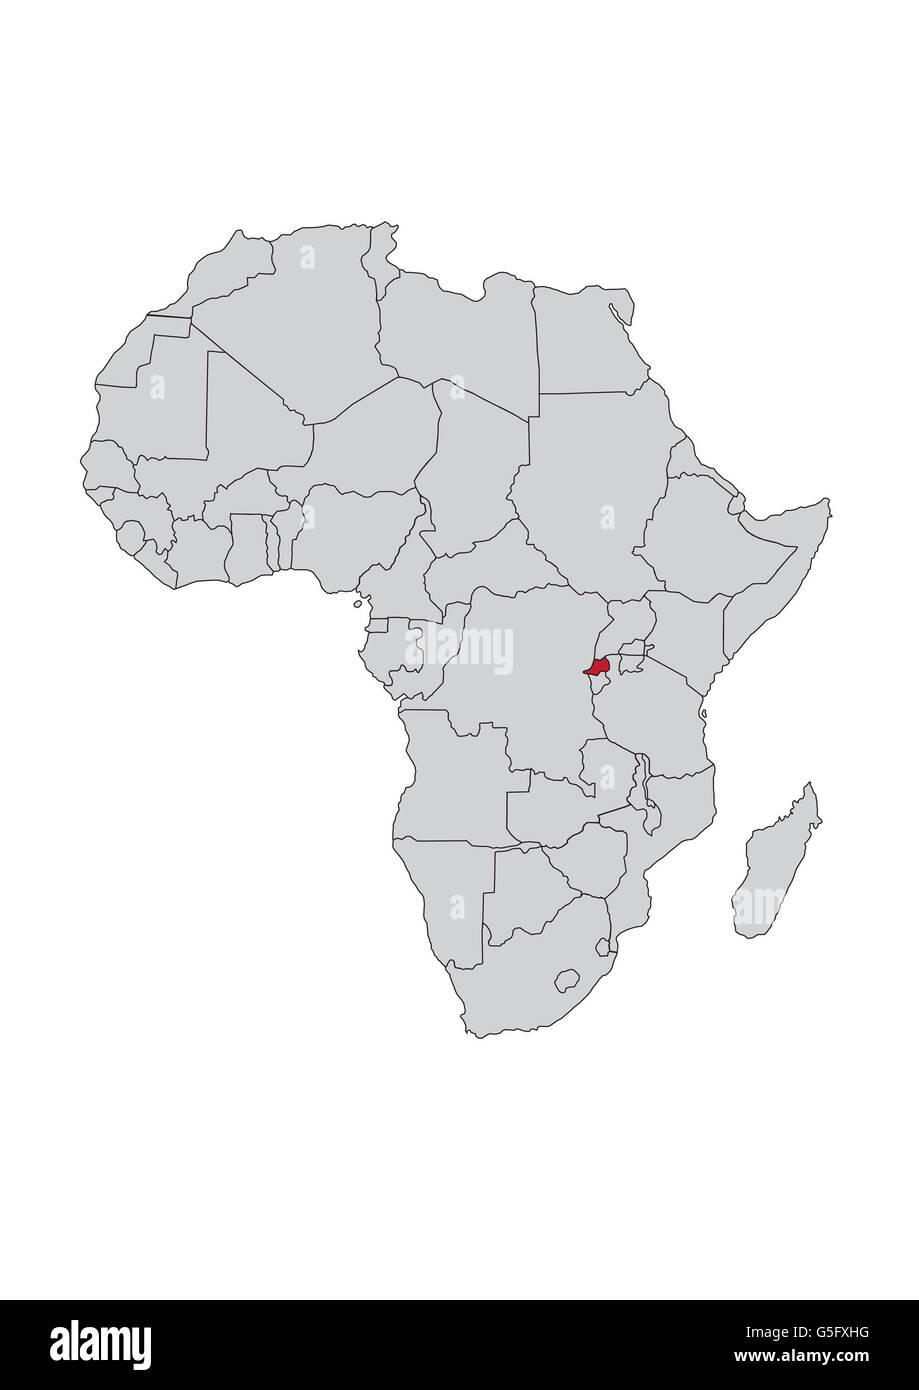 Map of Africa, Rwanda - Stock Image